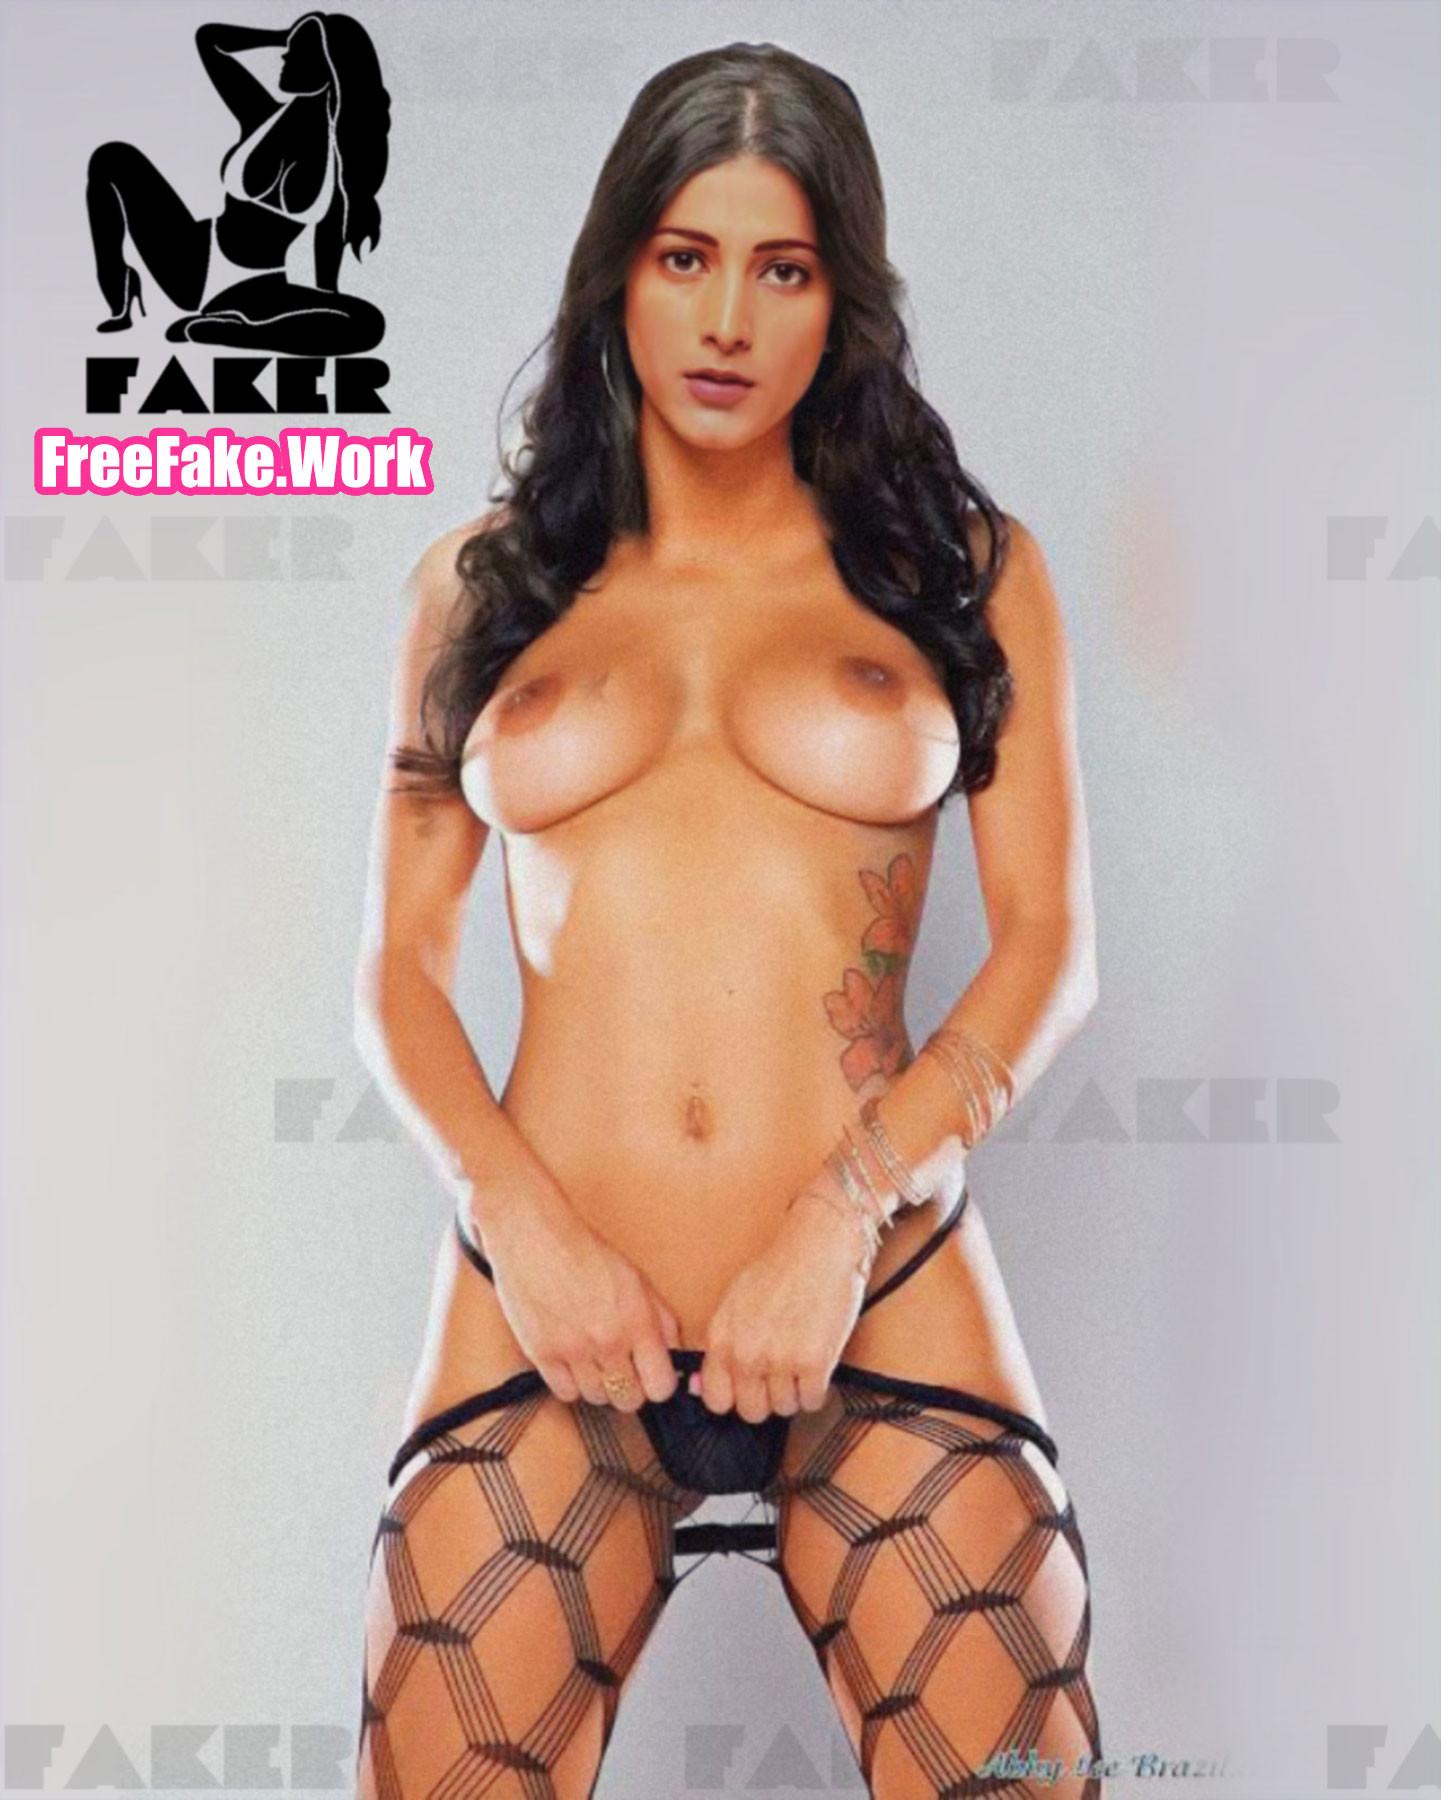 Shruti-Haasan-topless-real-small-boobs-xnxx.jpg